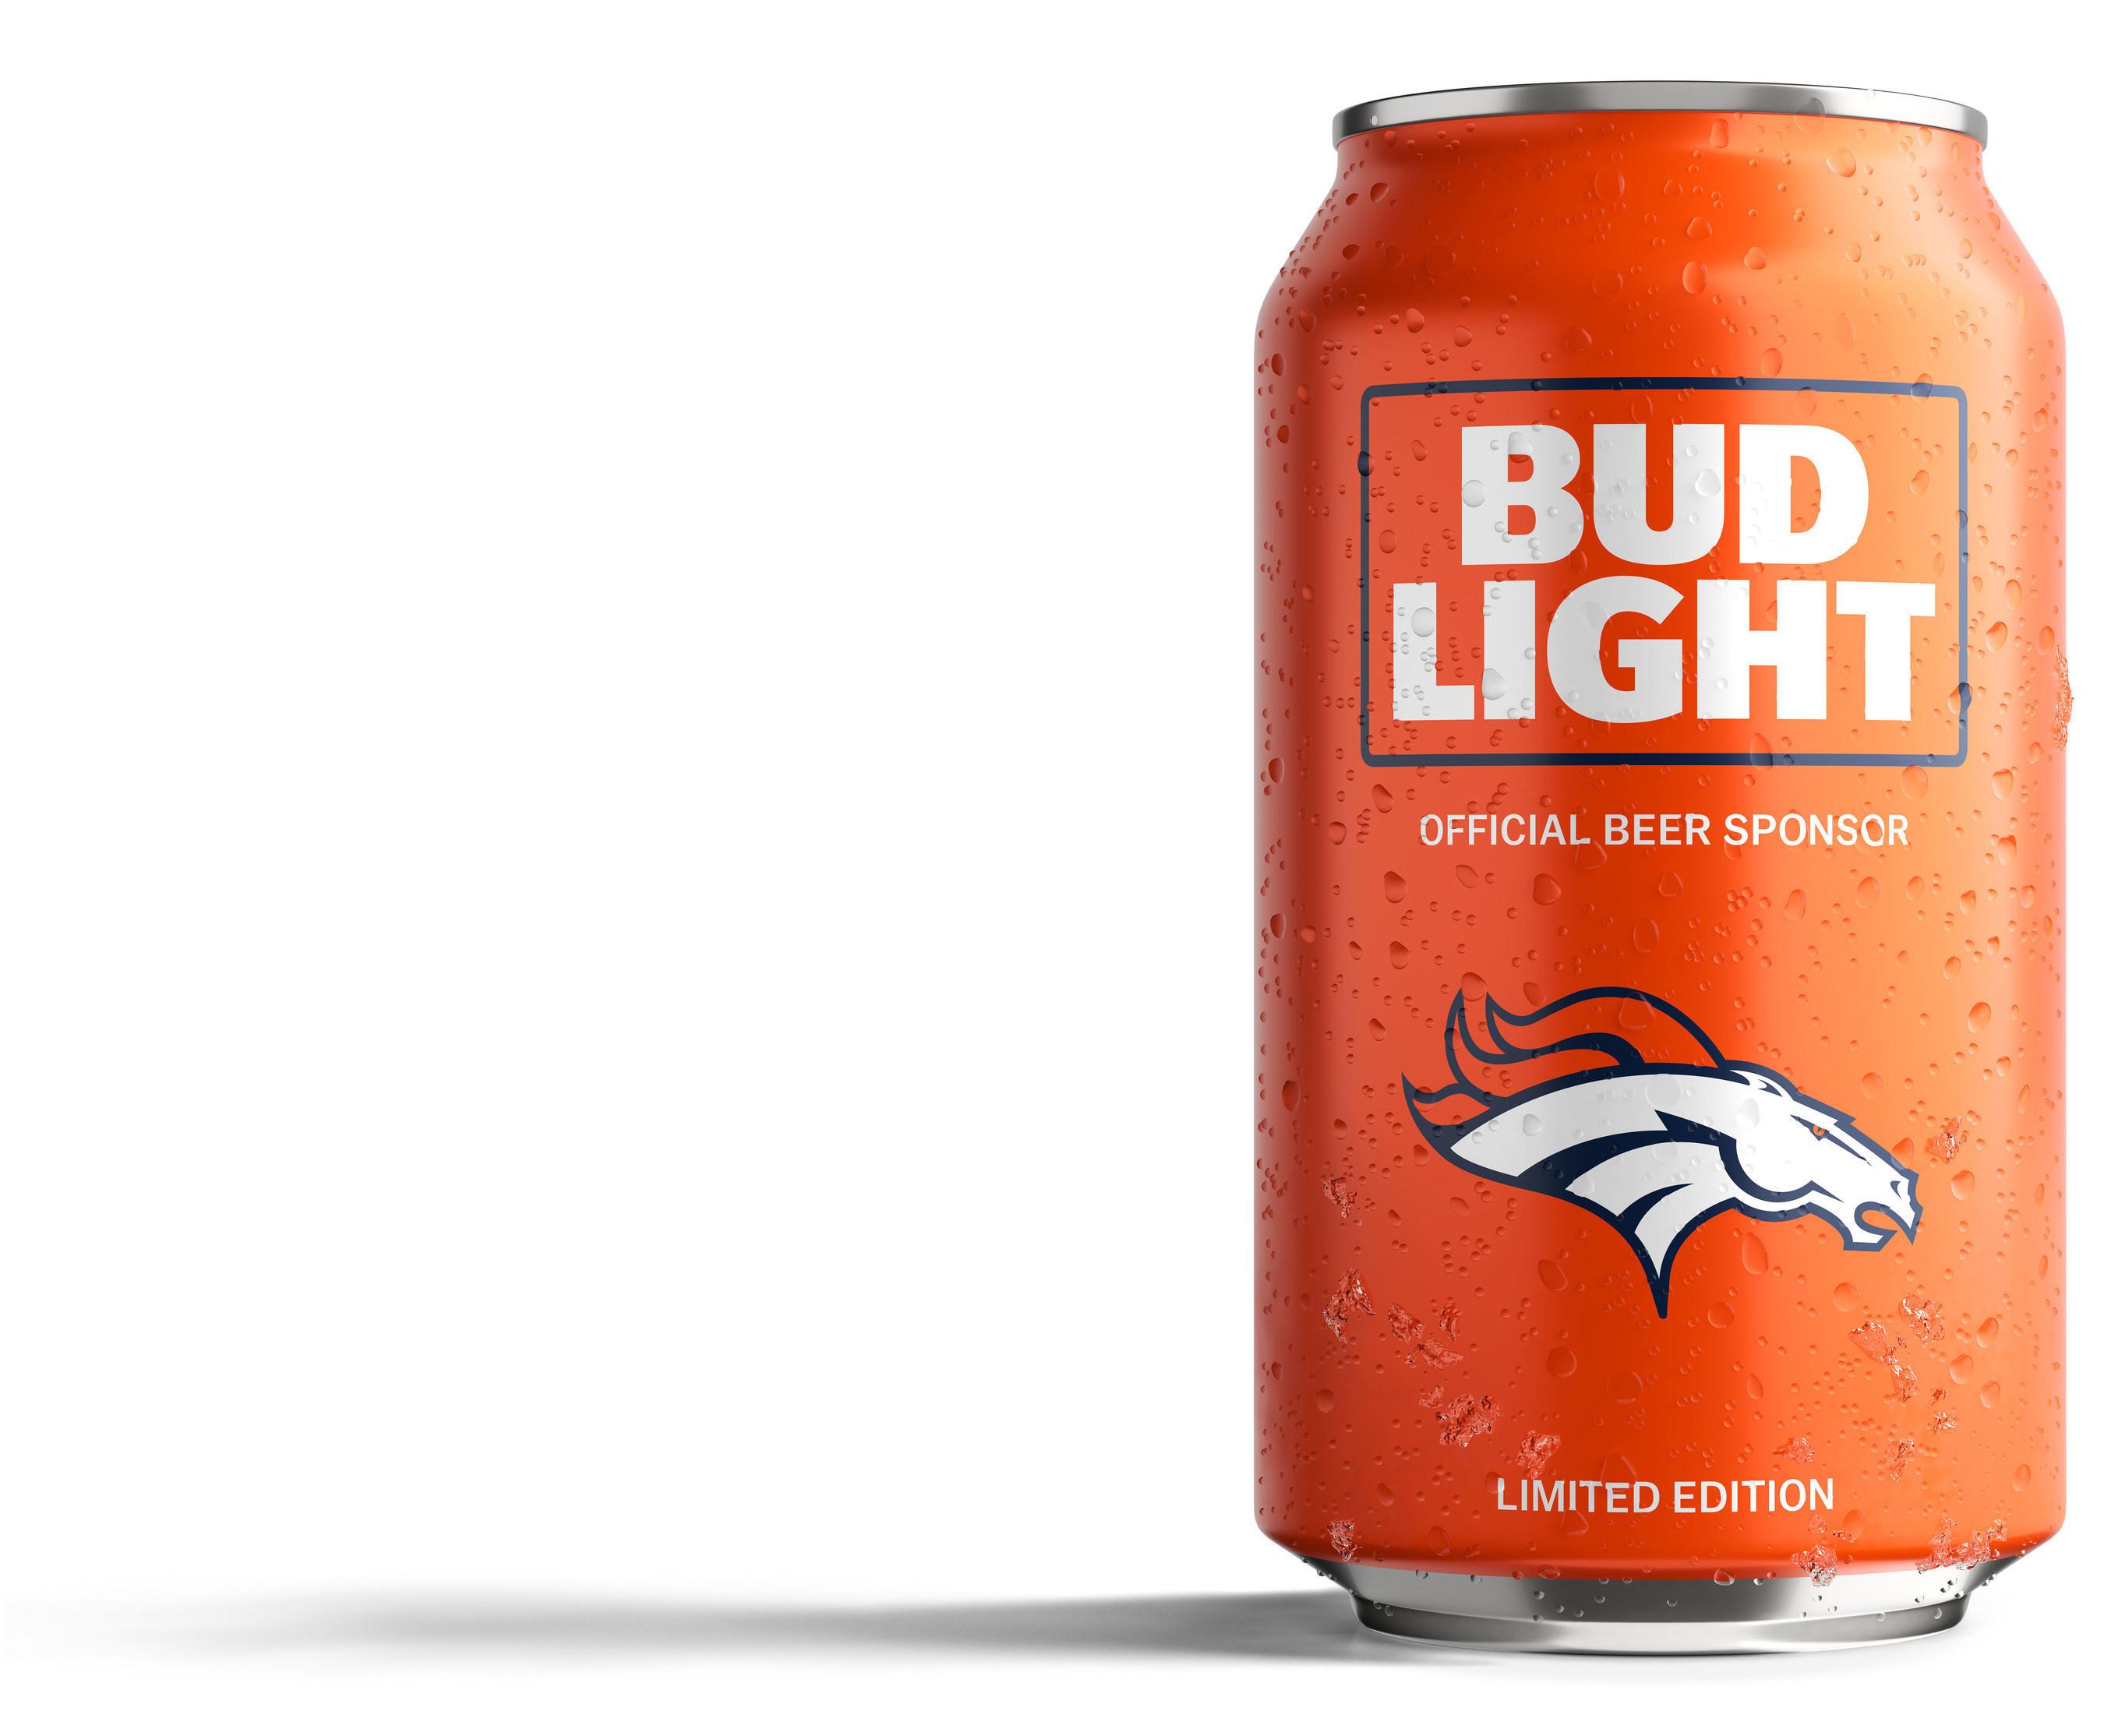 2016 DENVER BRONCOS NFL KICKOFF BUD LIGHT BEER CAN SPORT CHAMP COLORADO FOOTBALL